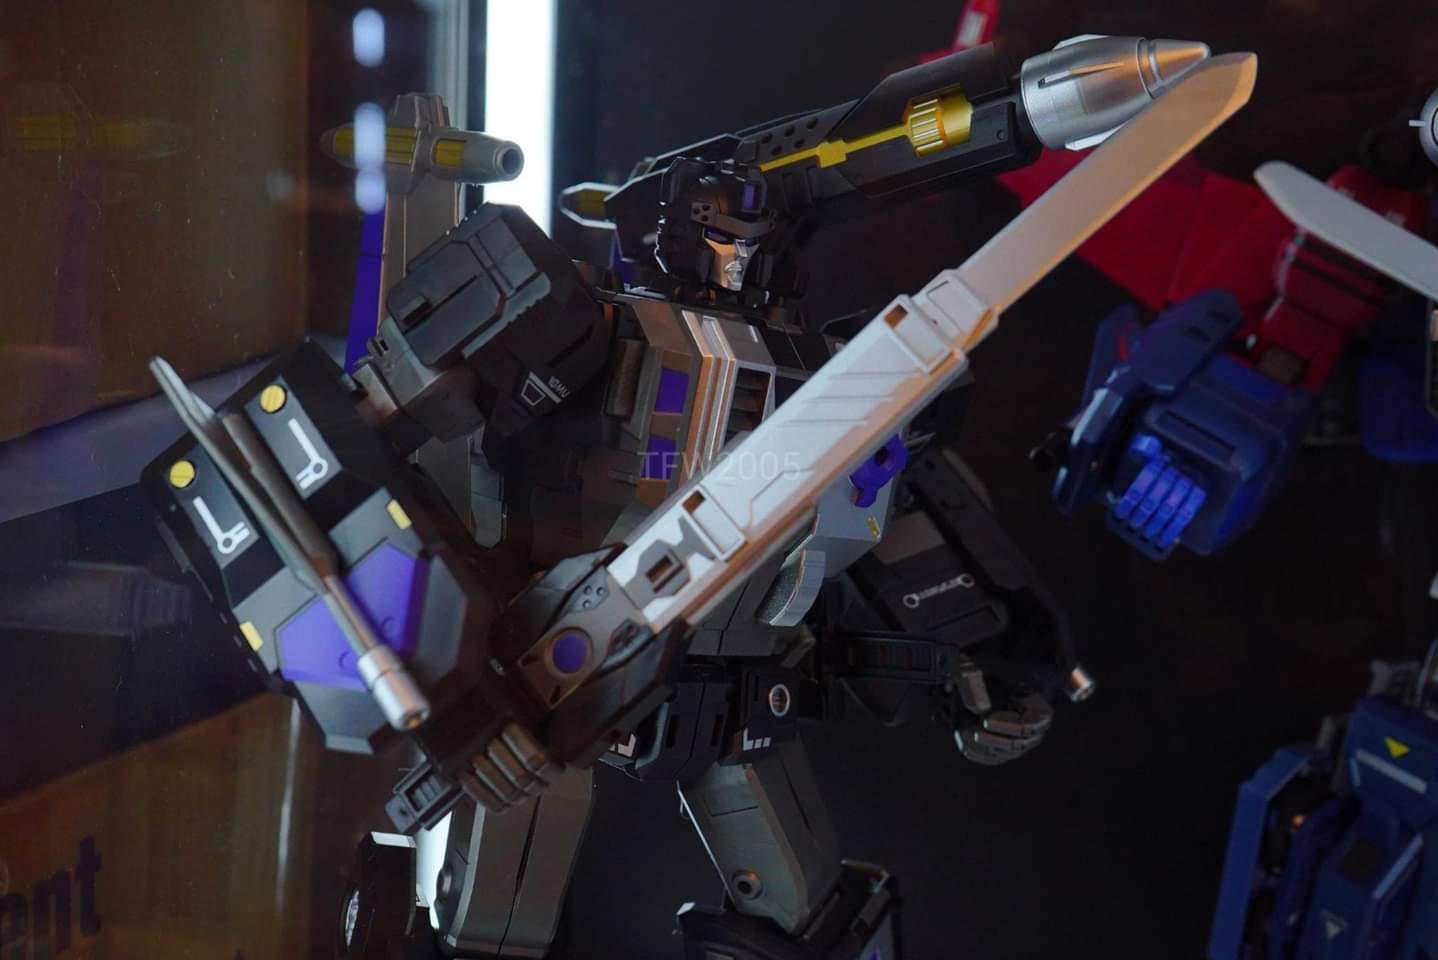 [FansHobby] Produit Tiers - MB-06 Power Baser (aka Powermaster Optimus) + MB-11 God Armour (aka Godbomber) - TF Masterforce - Page 4 UY2paU5n_o